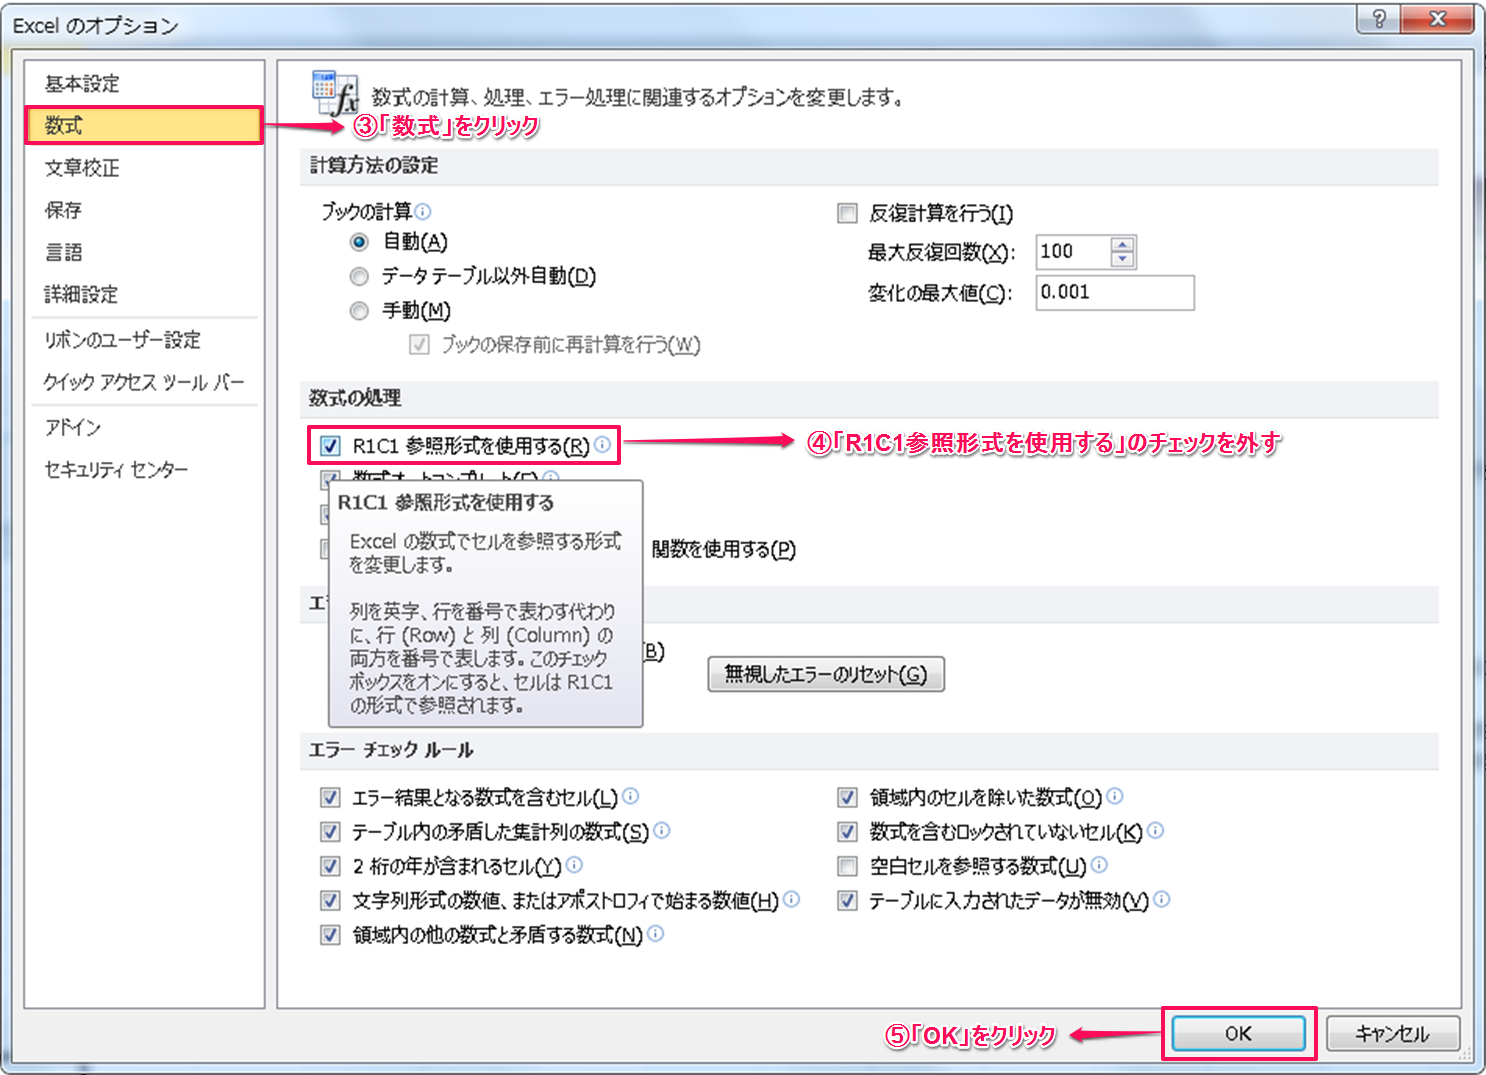 R1C1→A1変更方法②